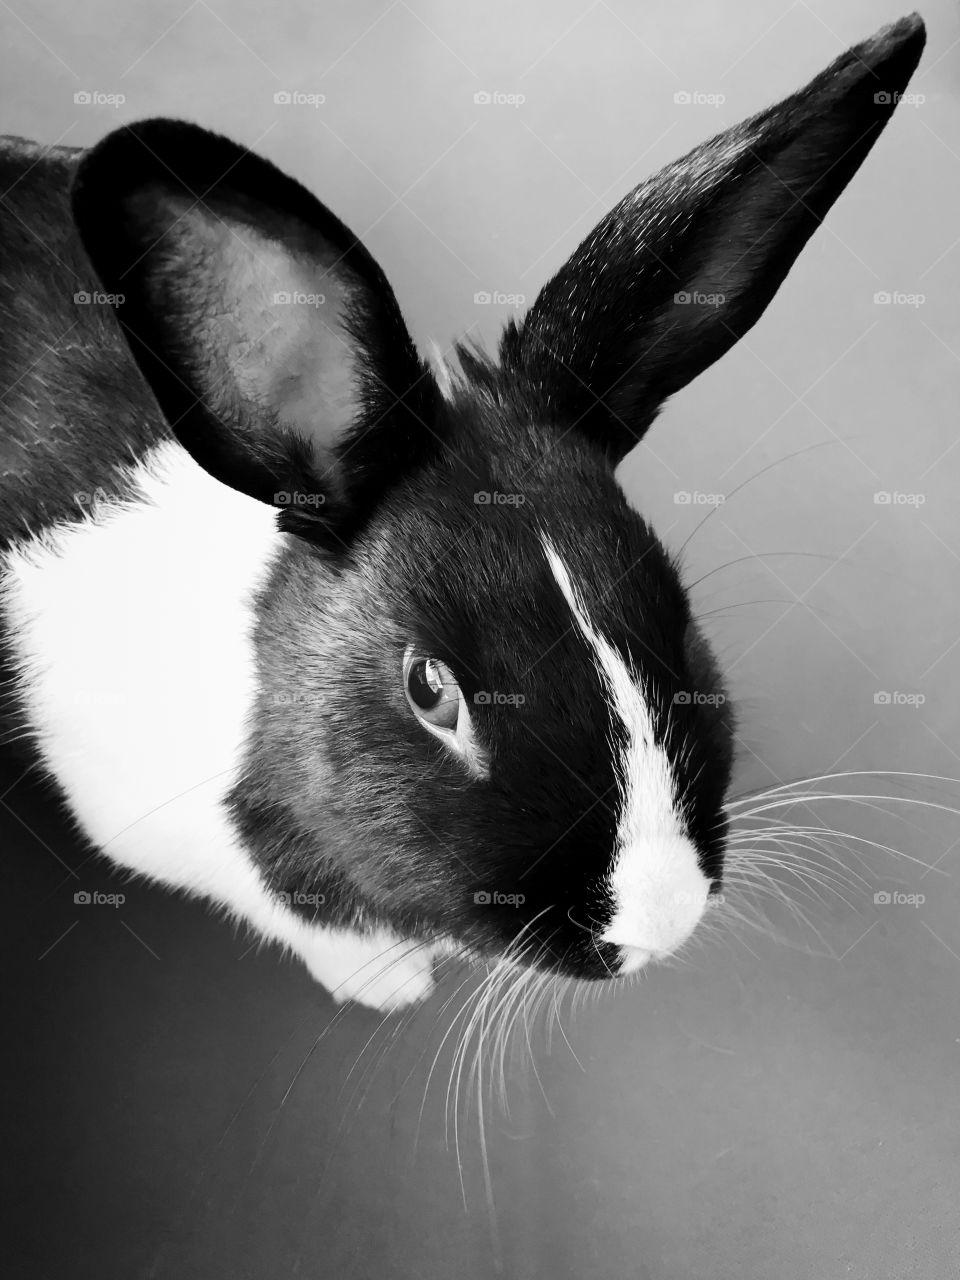 Close-up of rabbit